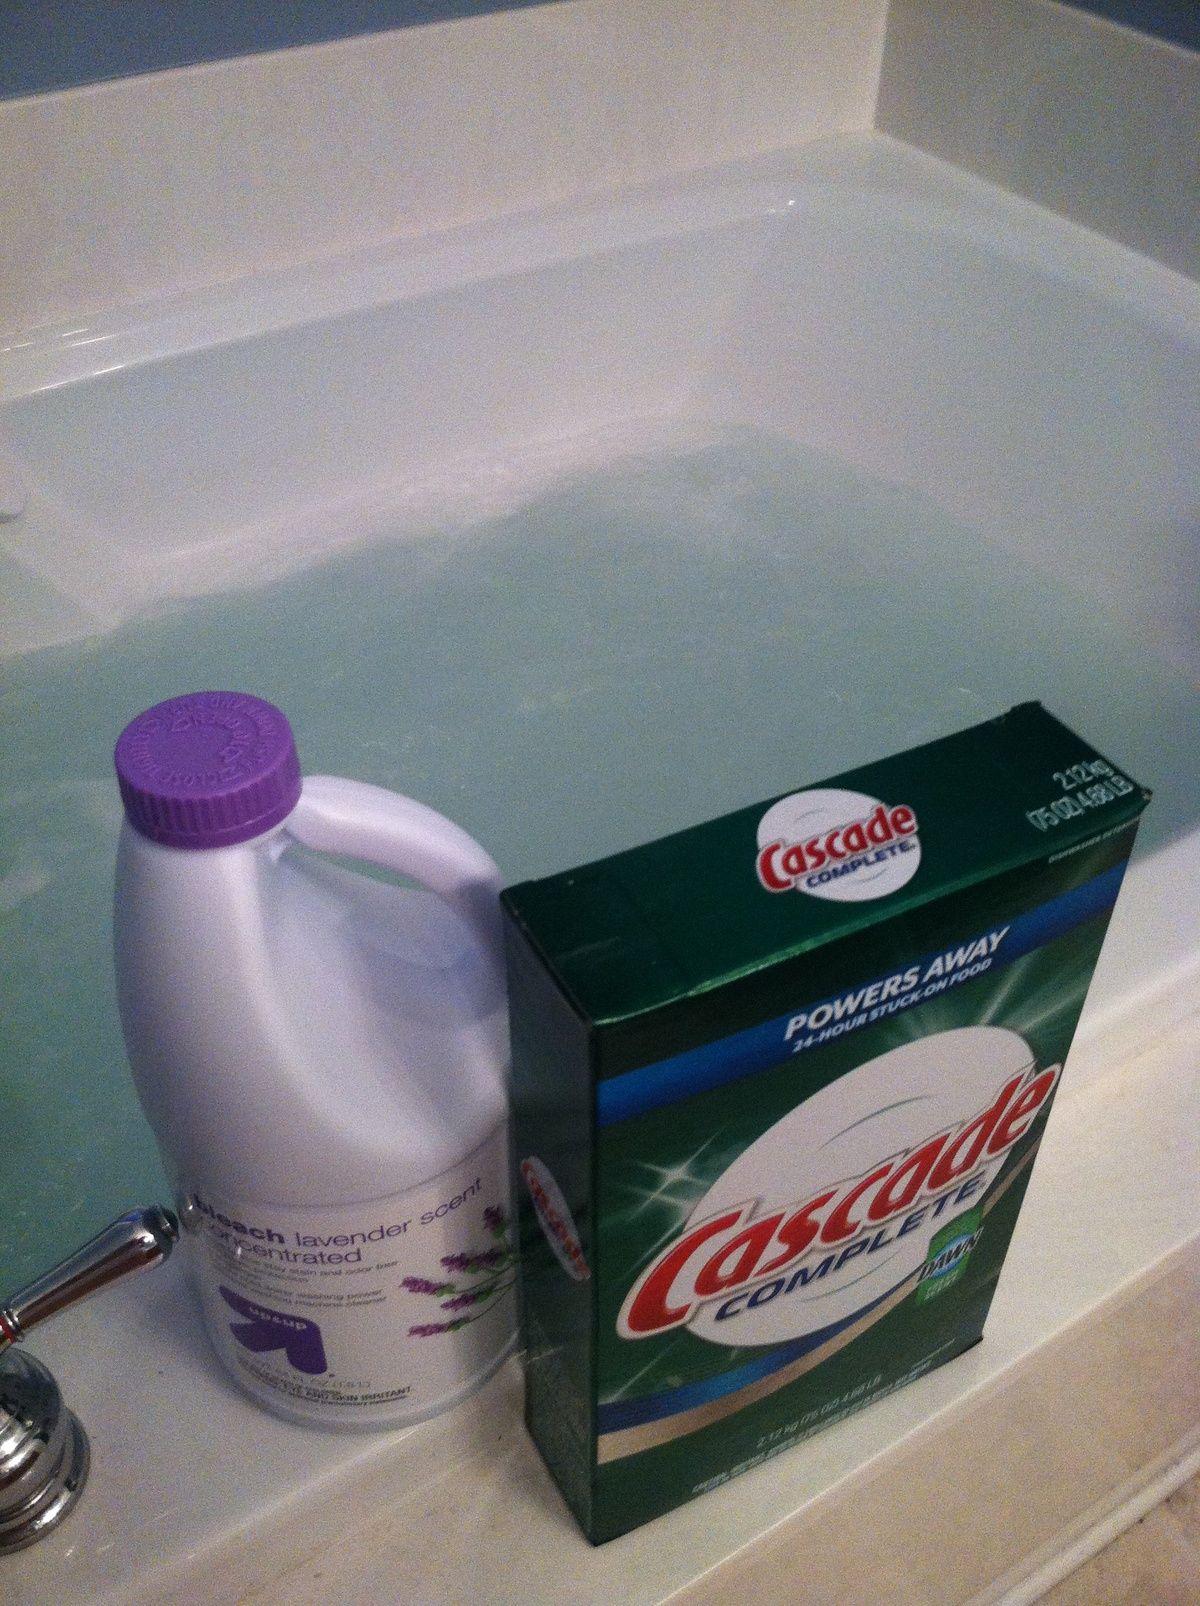 Clean jetted tub 1c dishwasher detergent plus 2c bleach